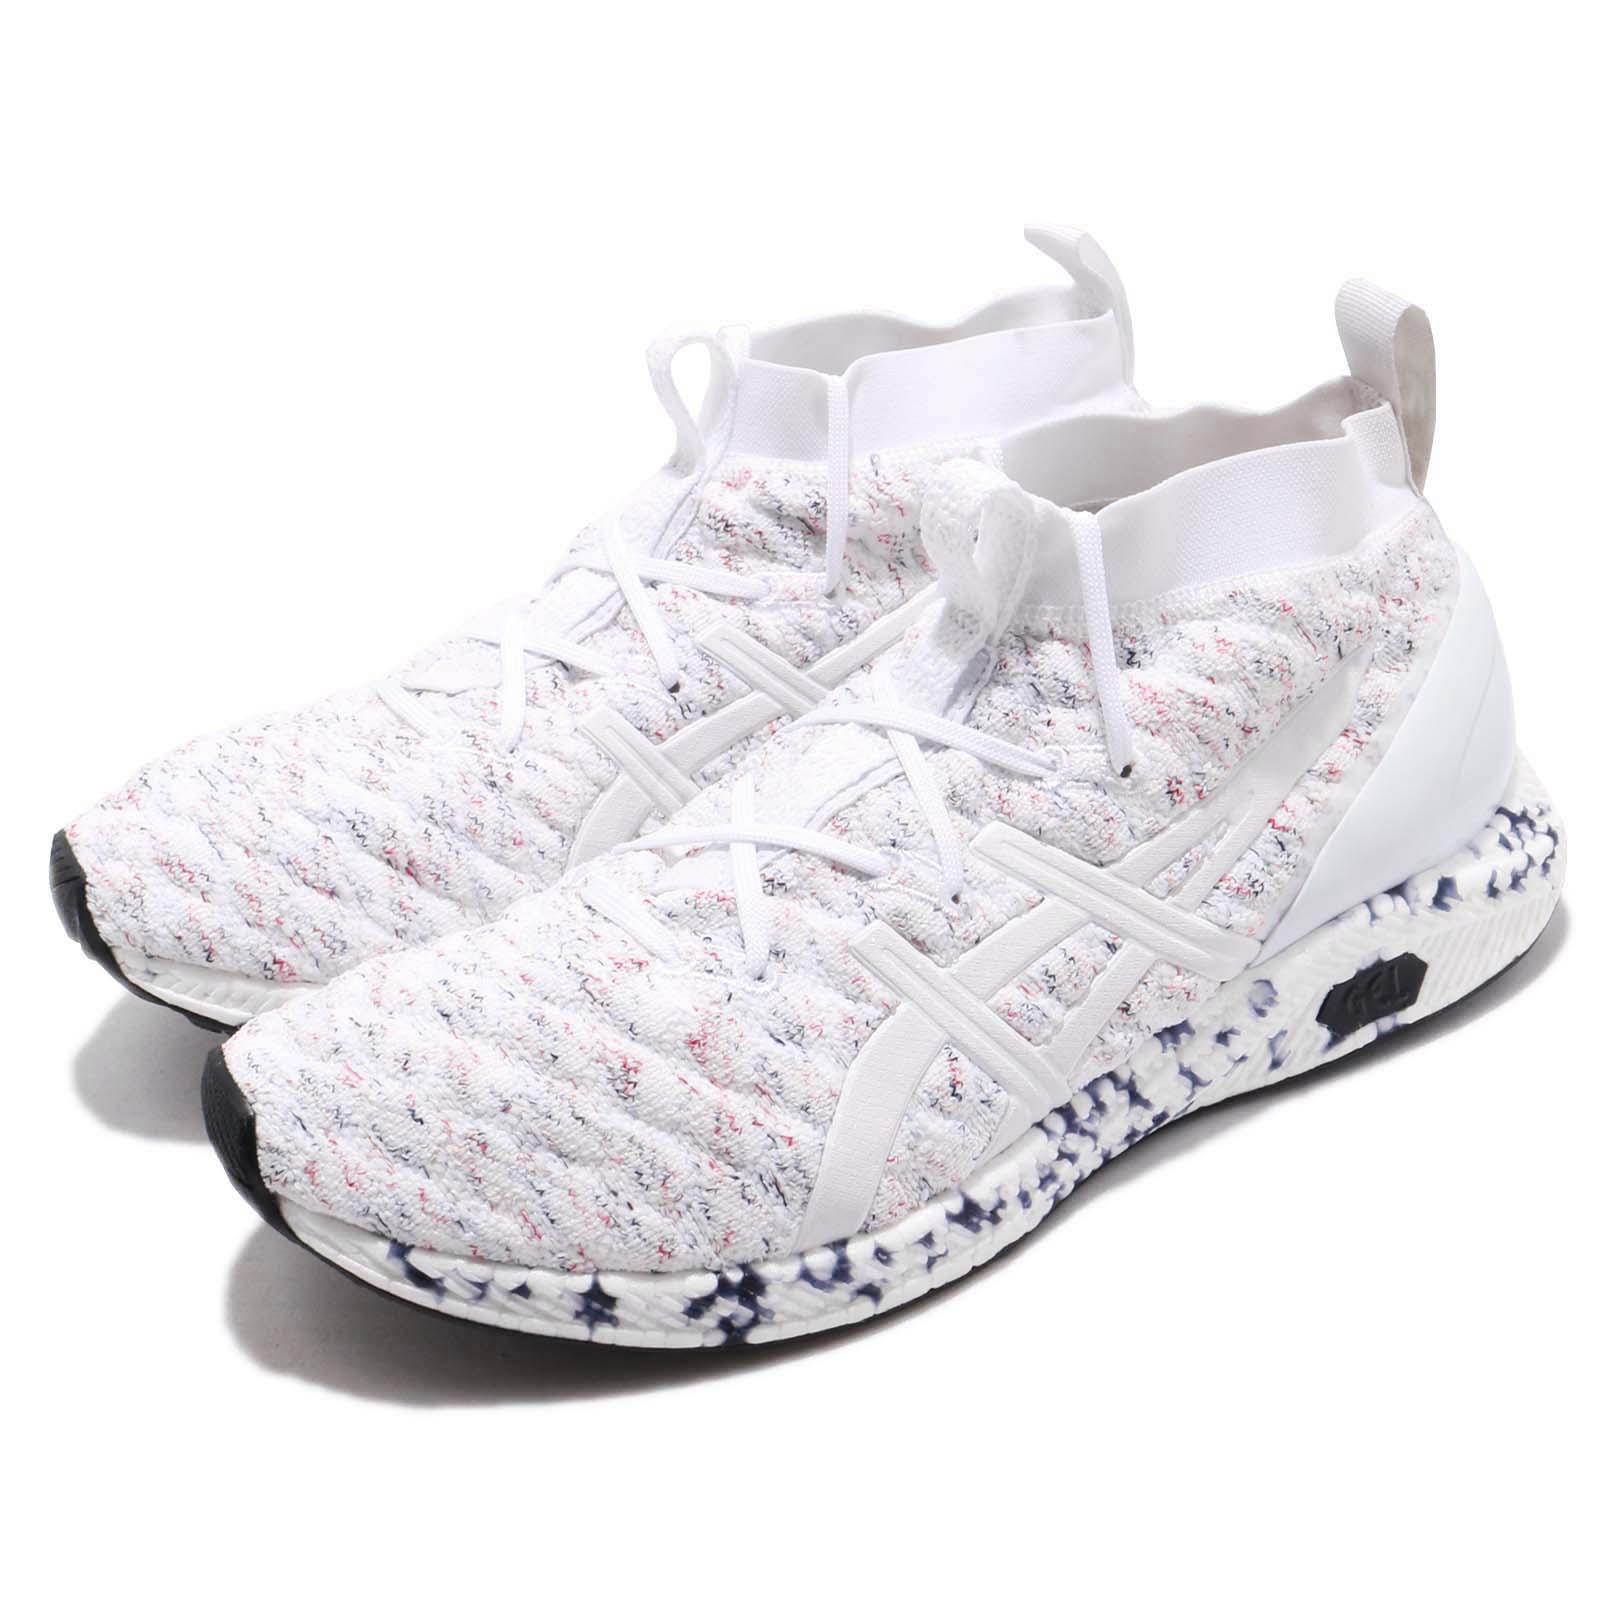 asics men's hypergel-kan running shoes | Sale OFF-50%